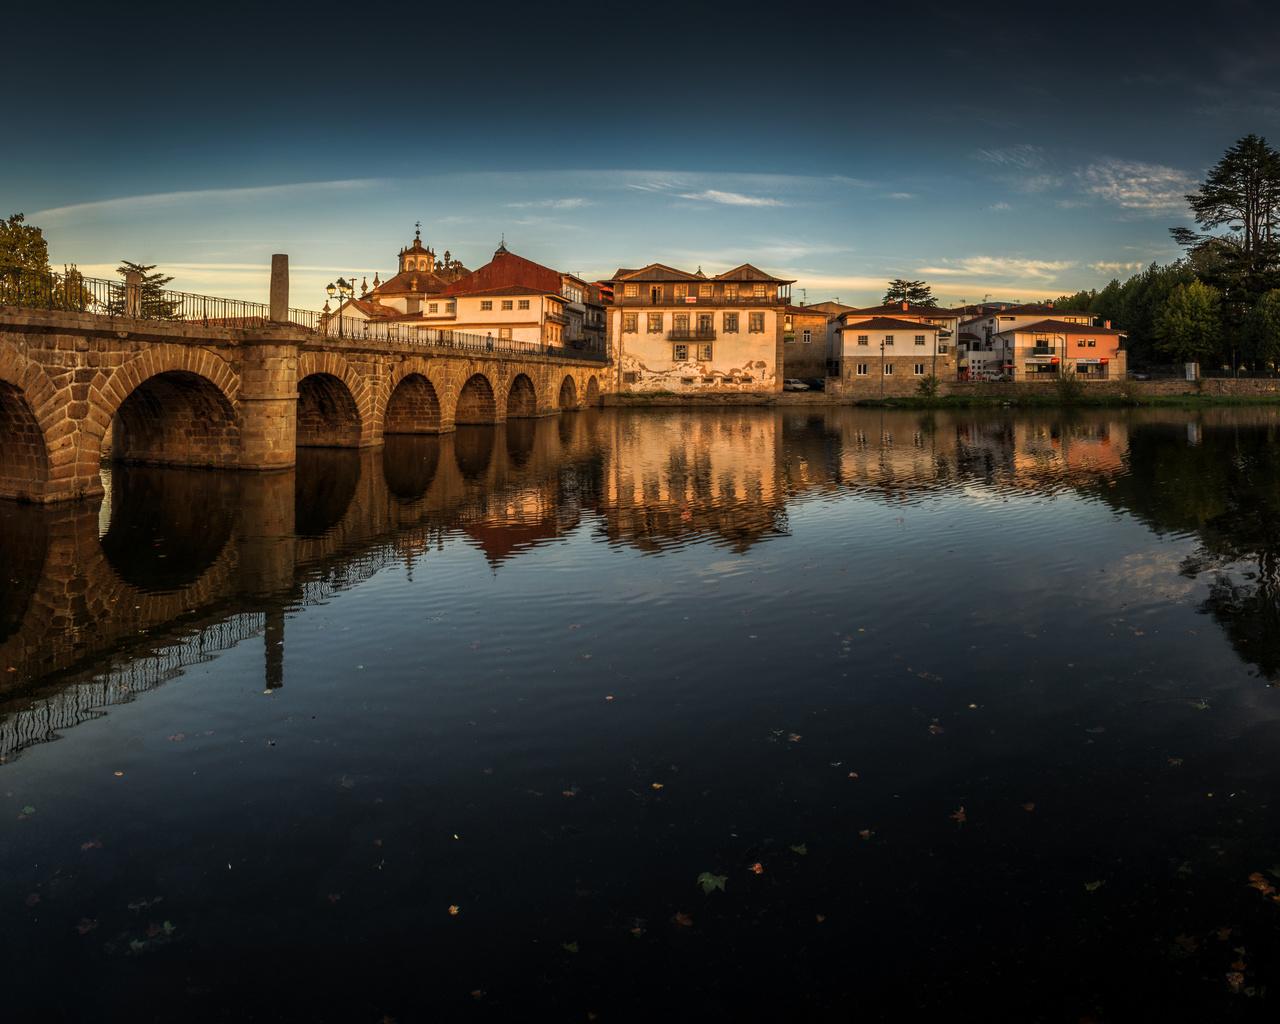 широкоформатные, португалия, река, мост, дома, панорама